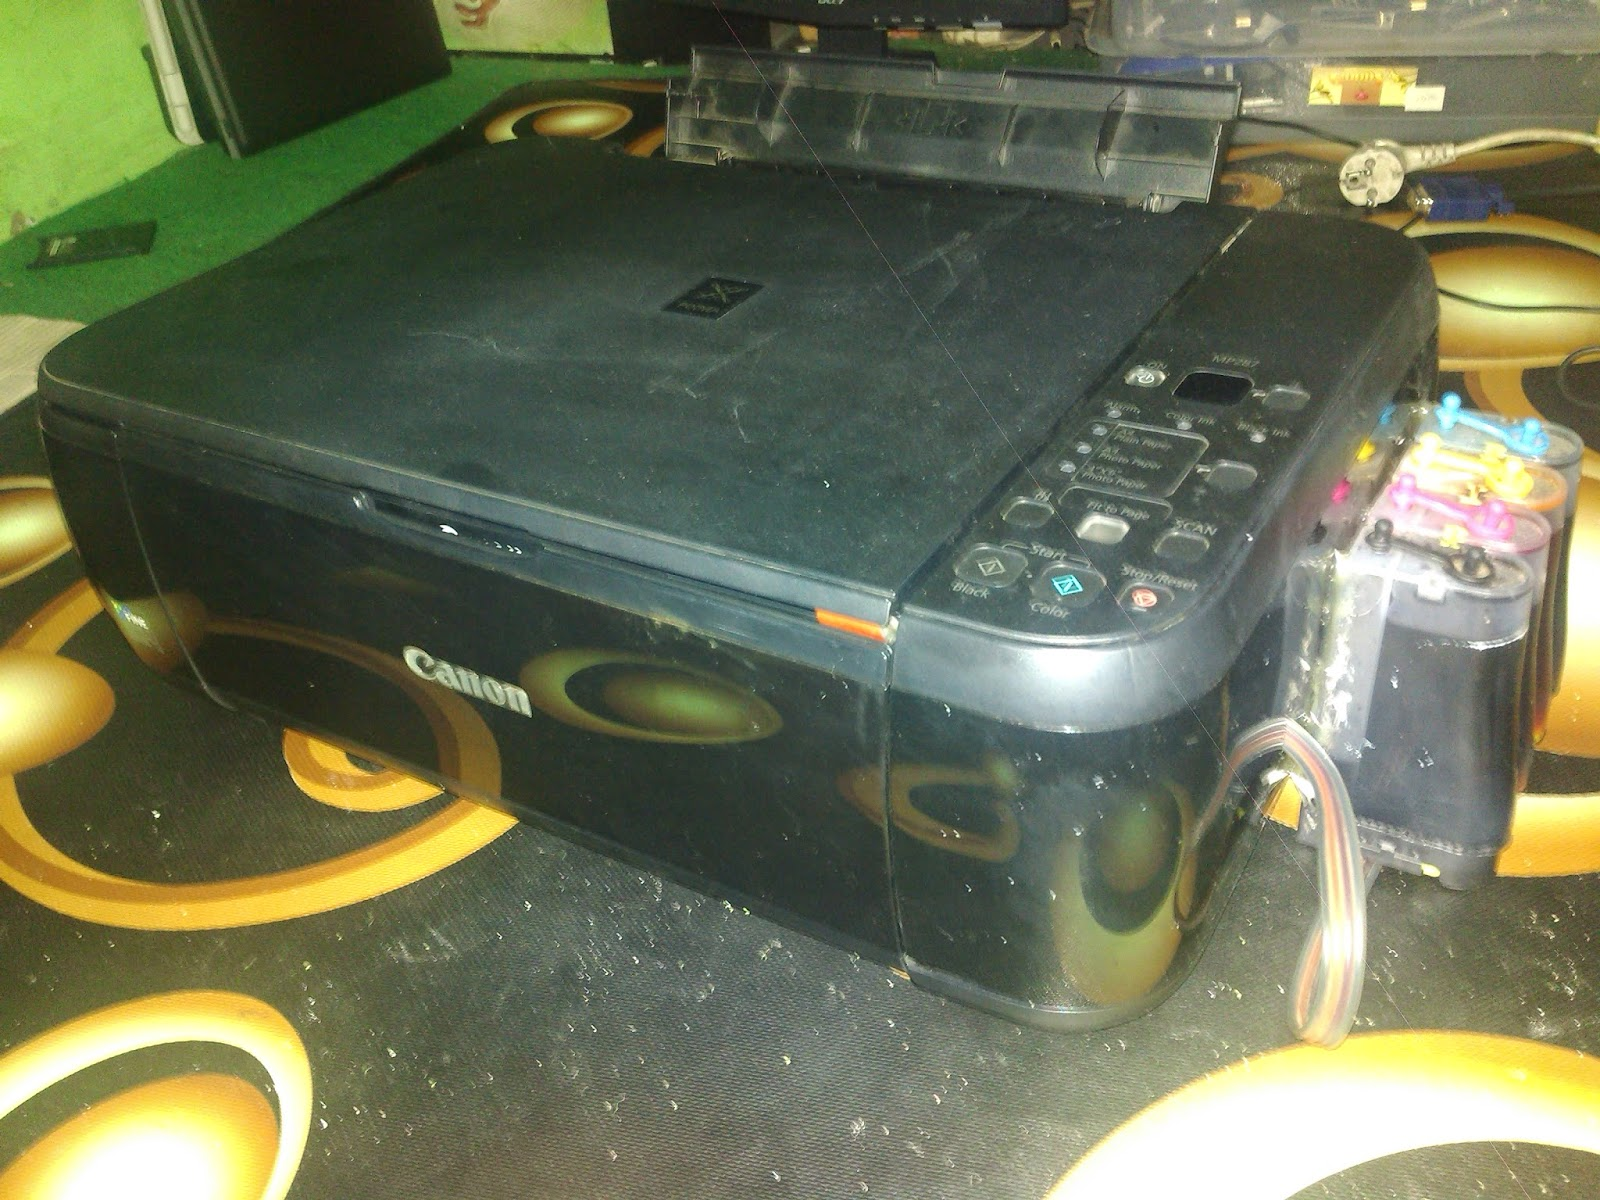 Service Laptop Servis Bergaransi Dan Printer Di Malang Canon Pg 40 Bekas Sepesifikasi Mp287 Scaner Normal Mekanik Catrit Wrna 811 Hitam 810 Ready Infus Tinta Penuh Kabel Usb Silver